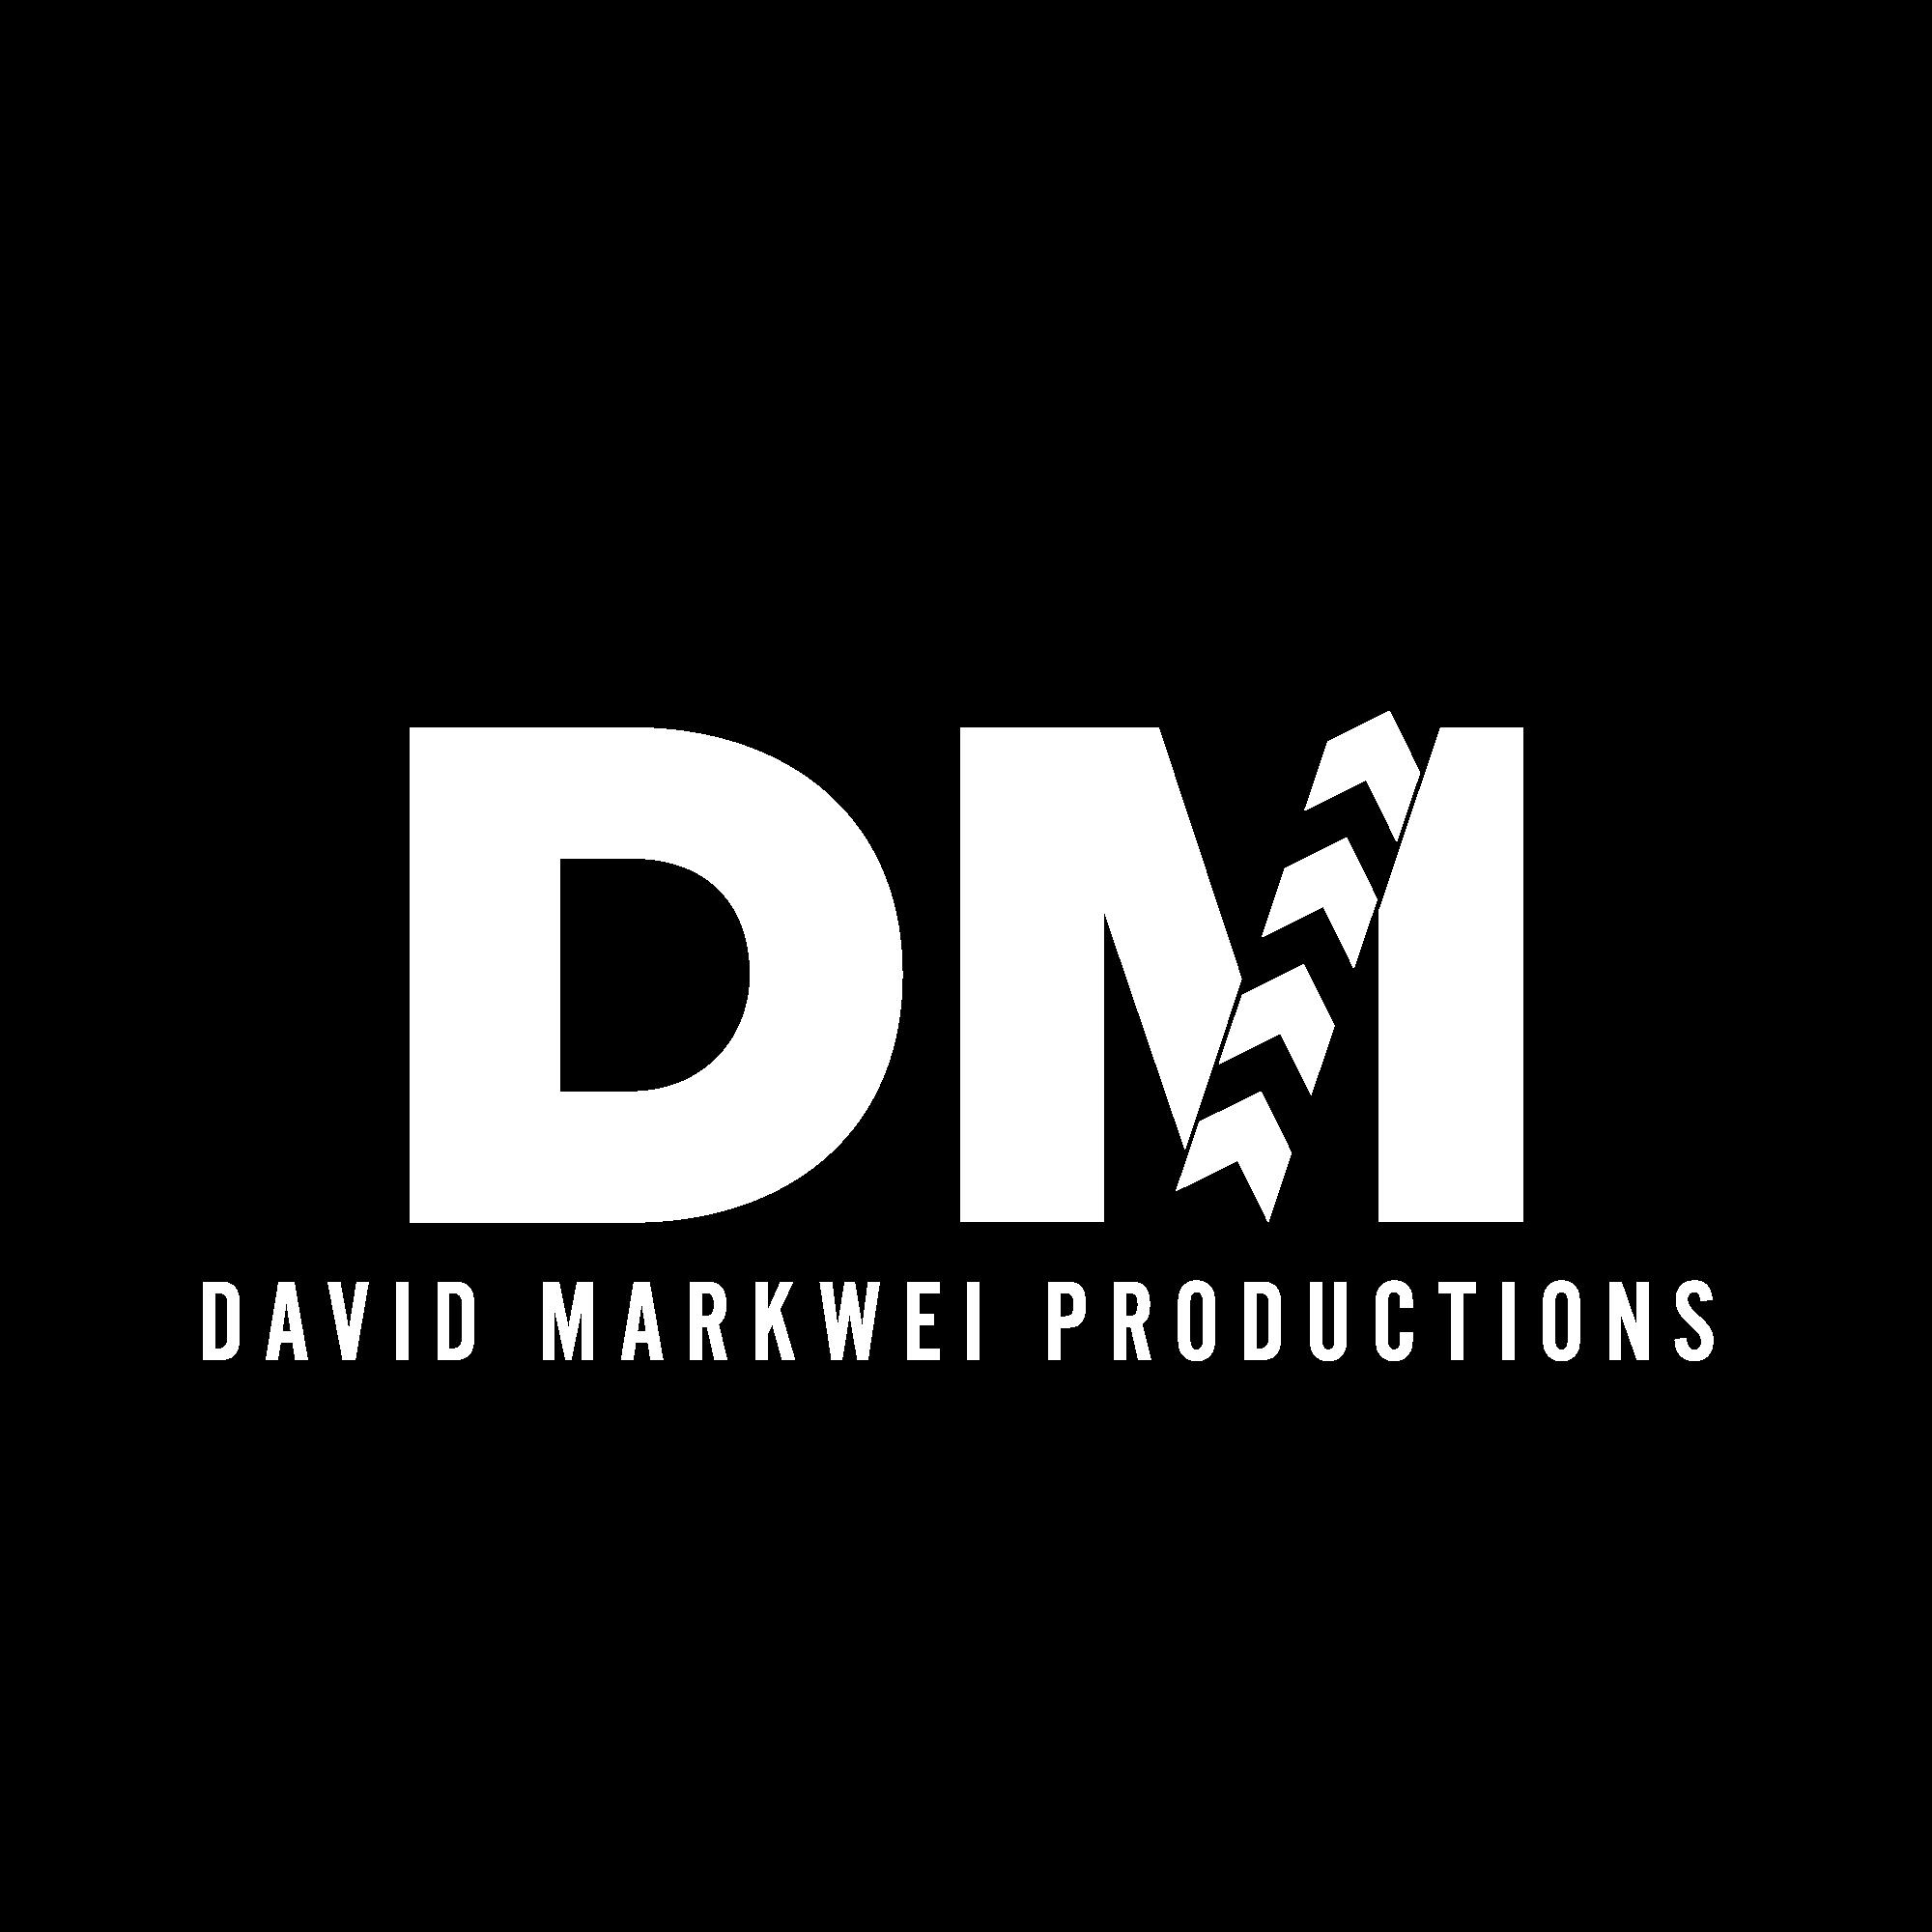 DAVID MARKWEI